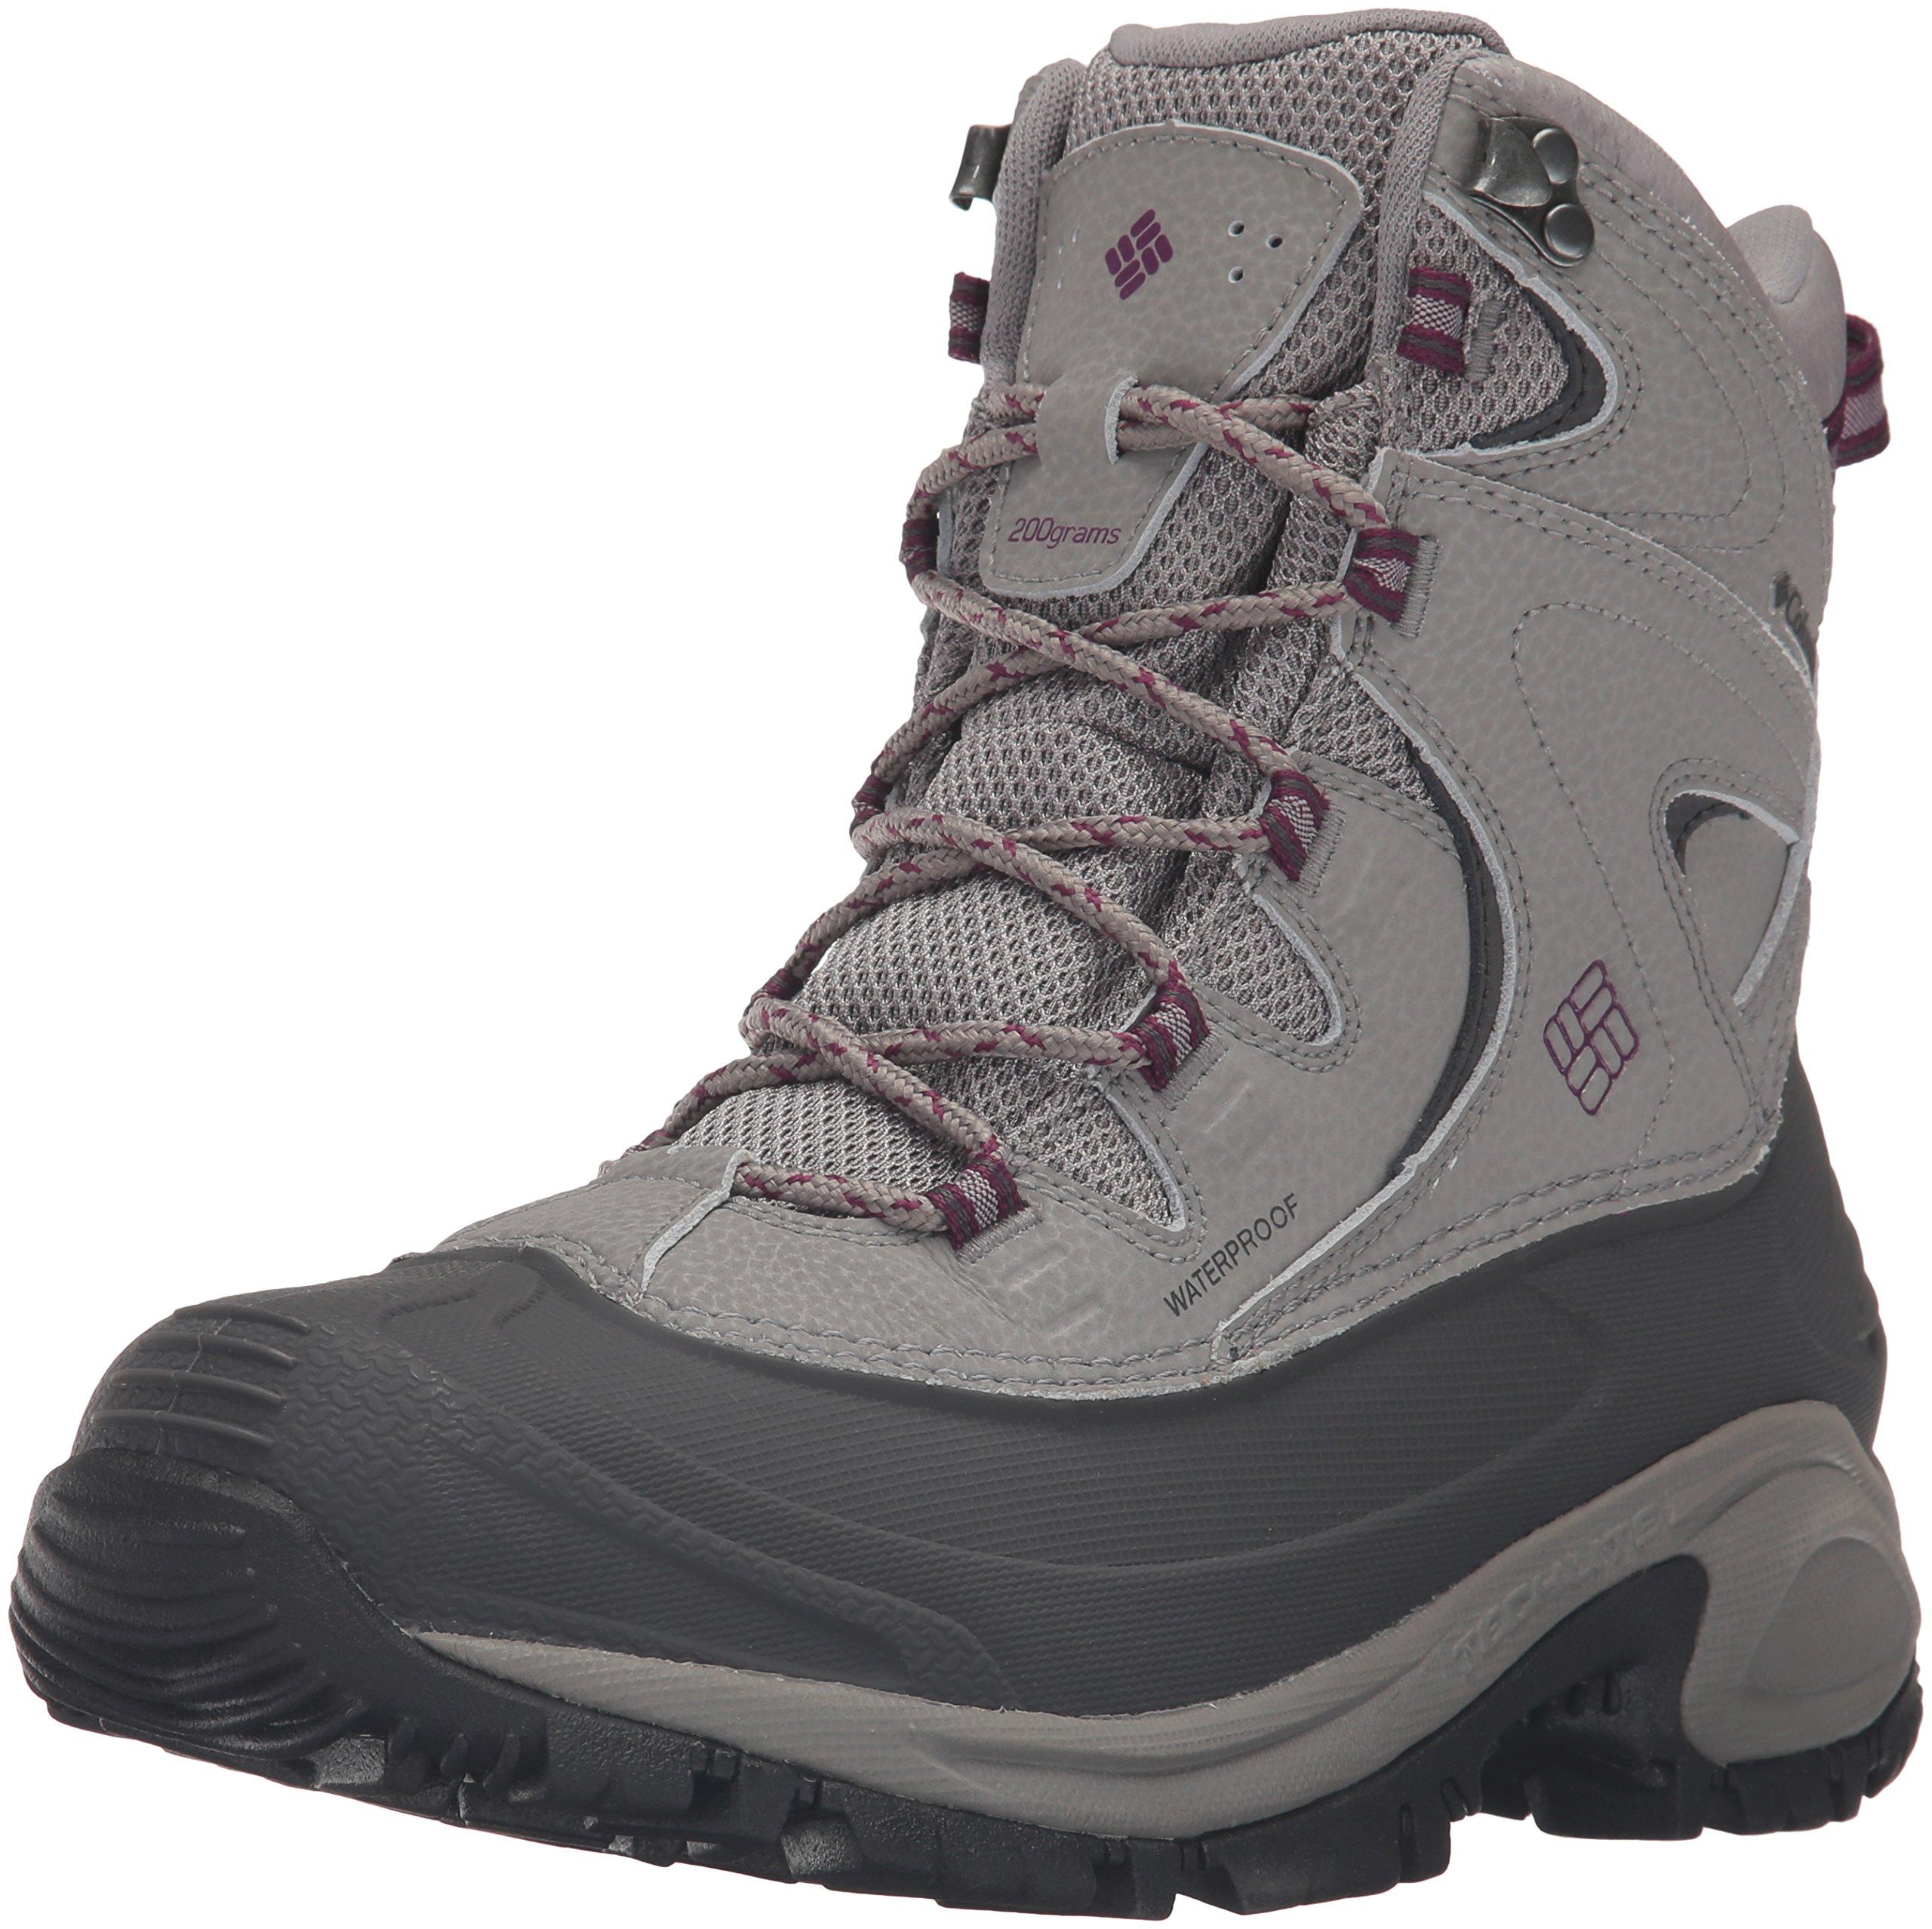 Columbia Women's Bugaboot II Snow Boot, Light Grey/Dark Raspberry, 9.5 B US